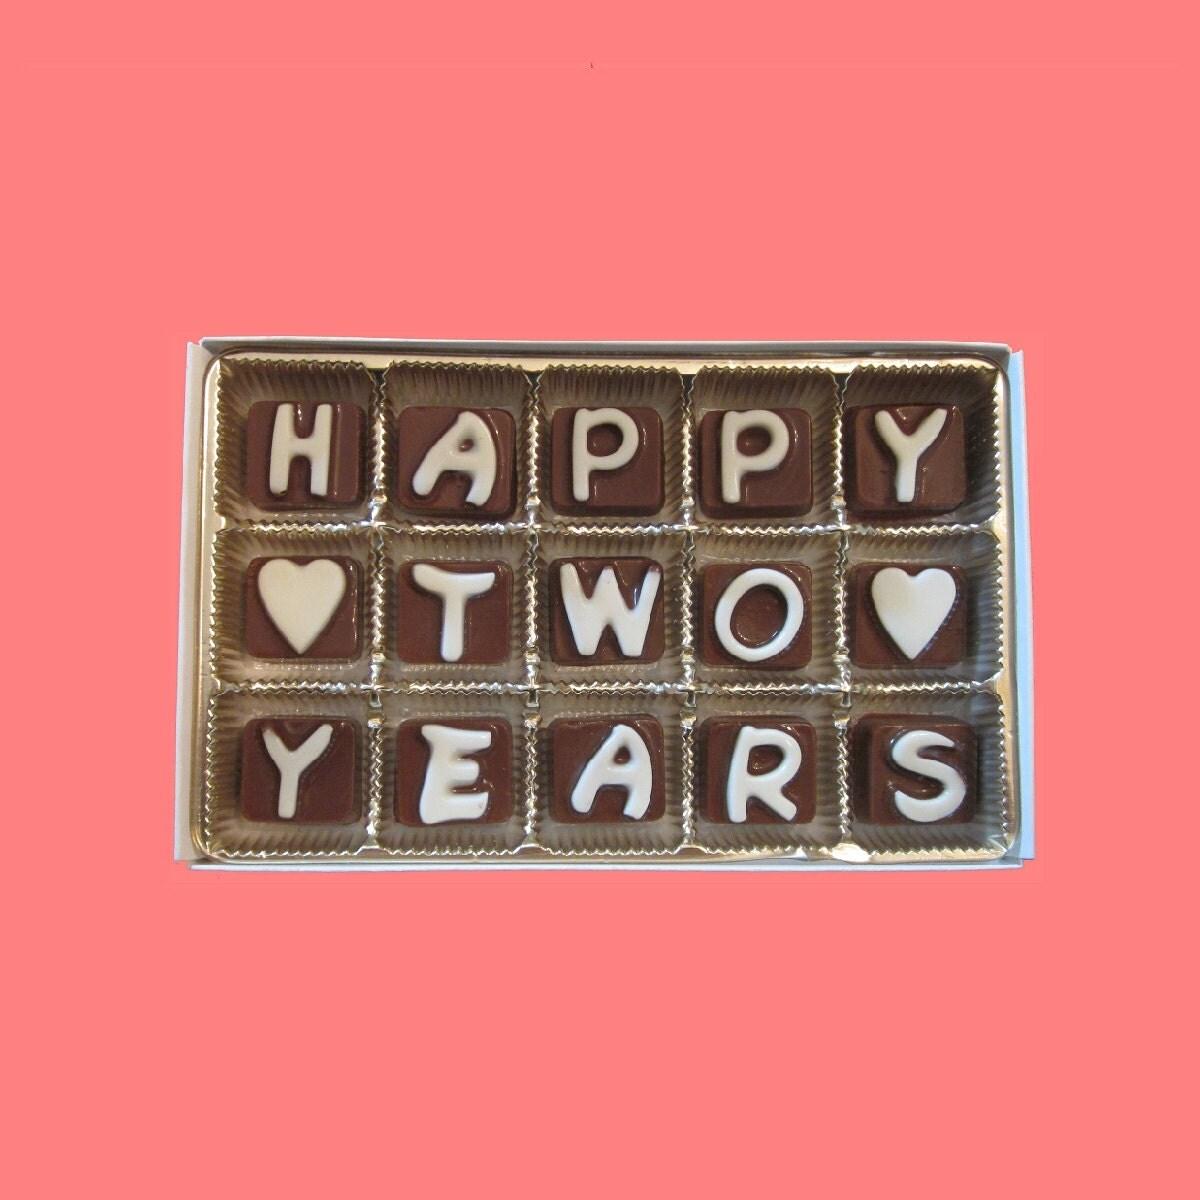 2 Year Anniversary Gift: Second 2nd Anniversary Gift For BF Boyfriend Girlfriend